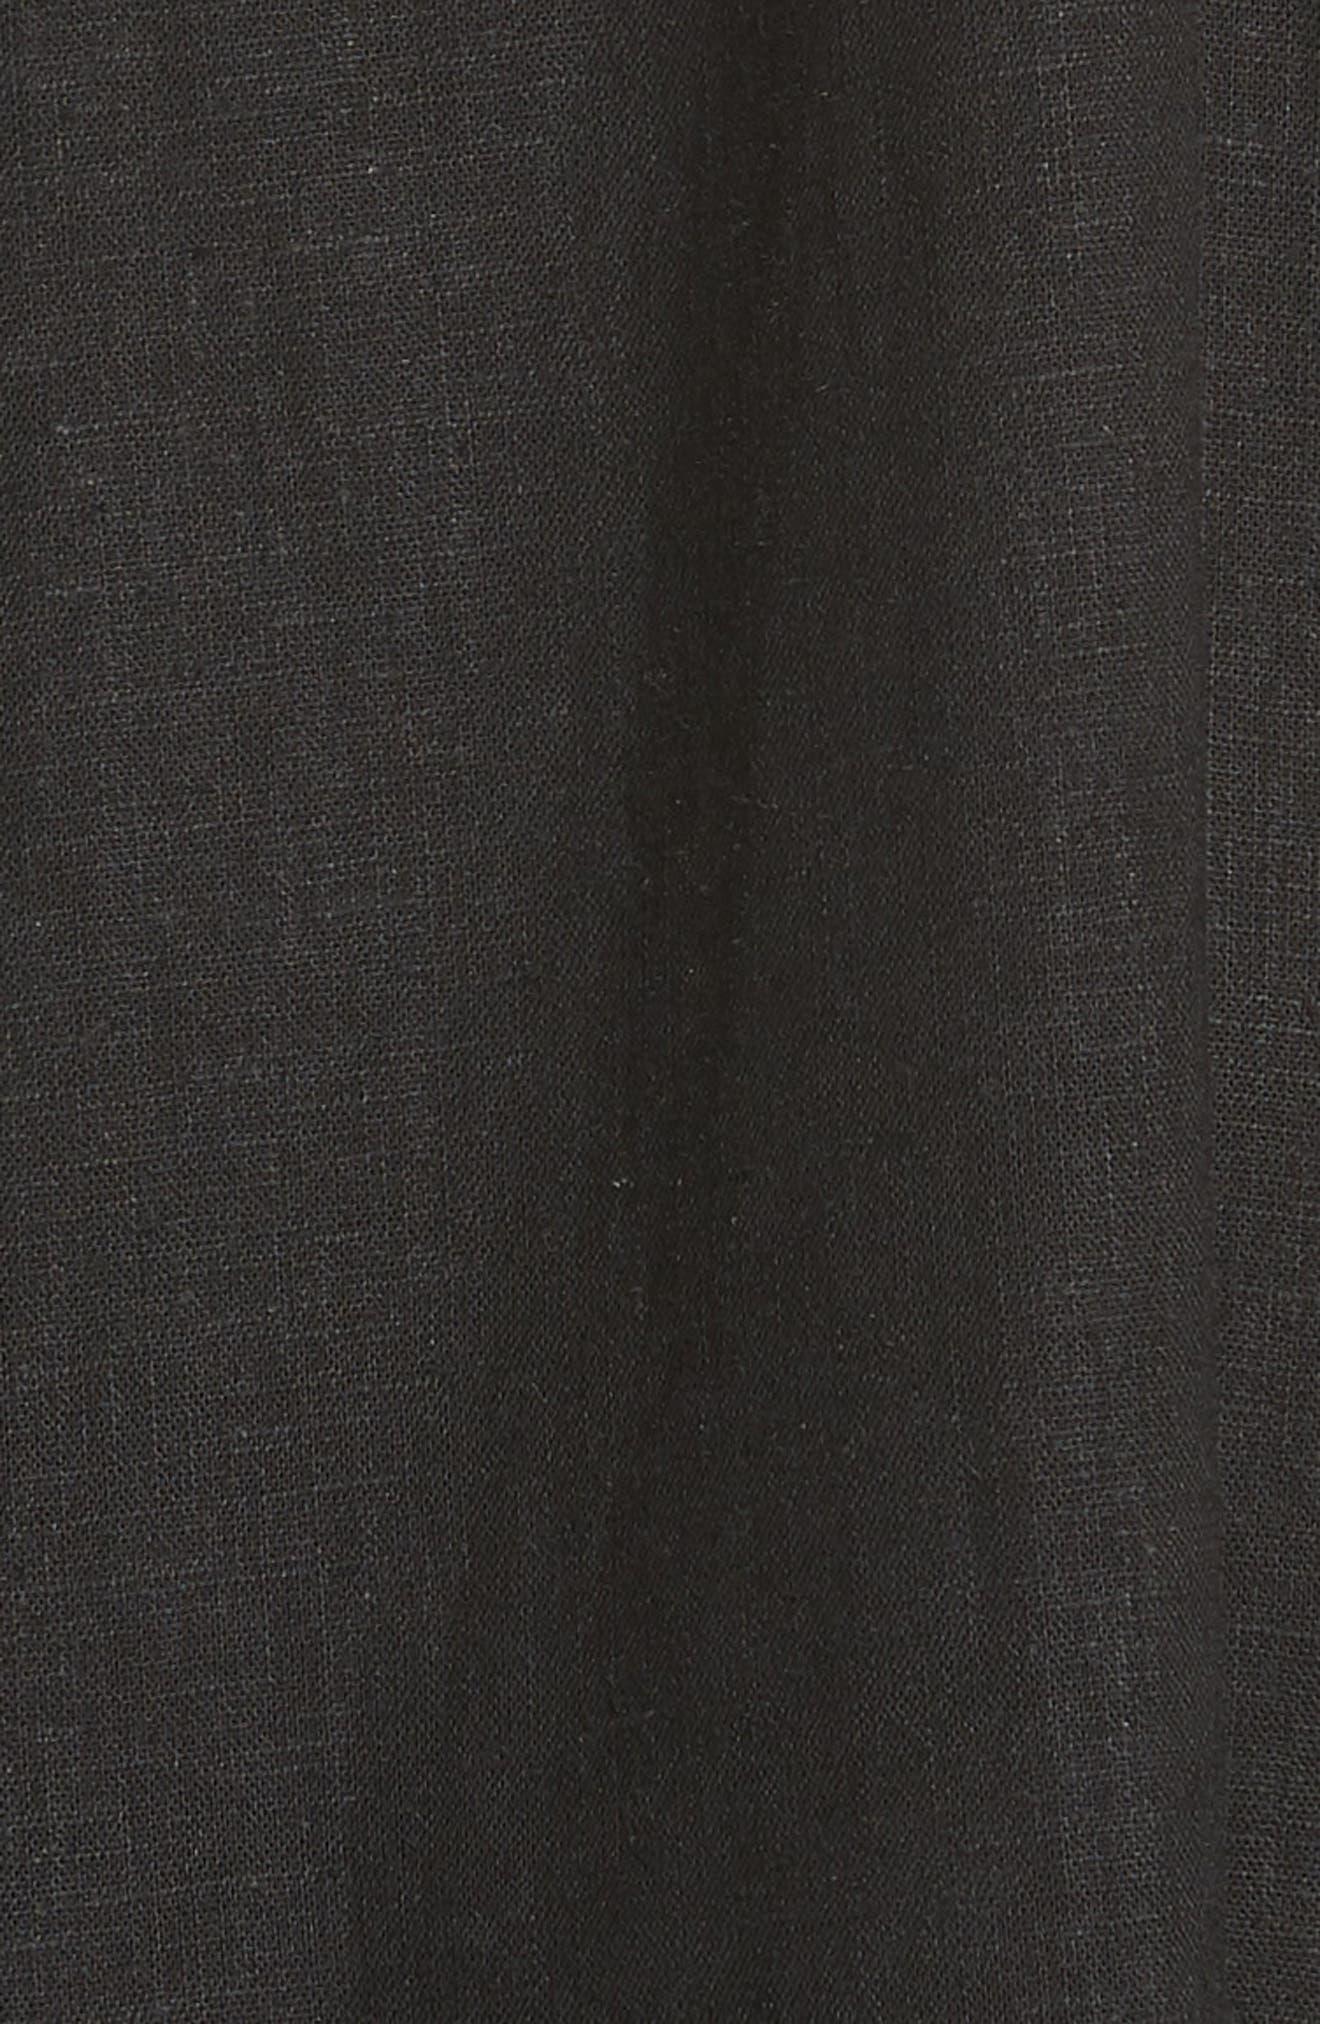 Drape Neck Asymmetrical Hem Dress,                             Alternate thumbnail 5, color,                             Black